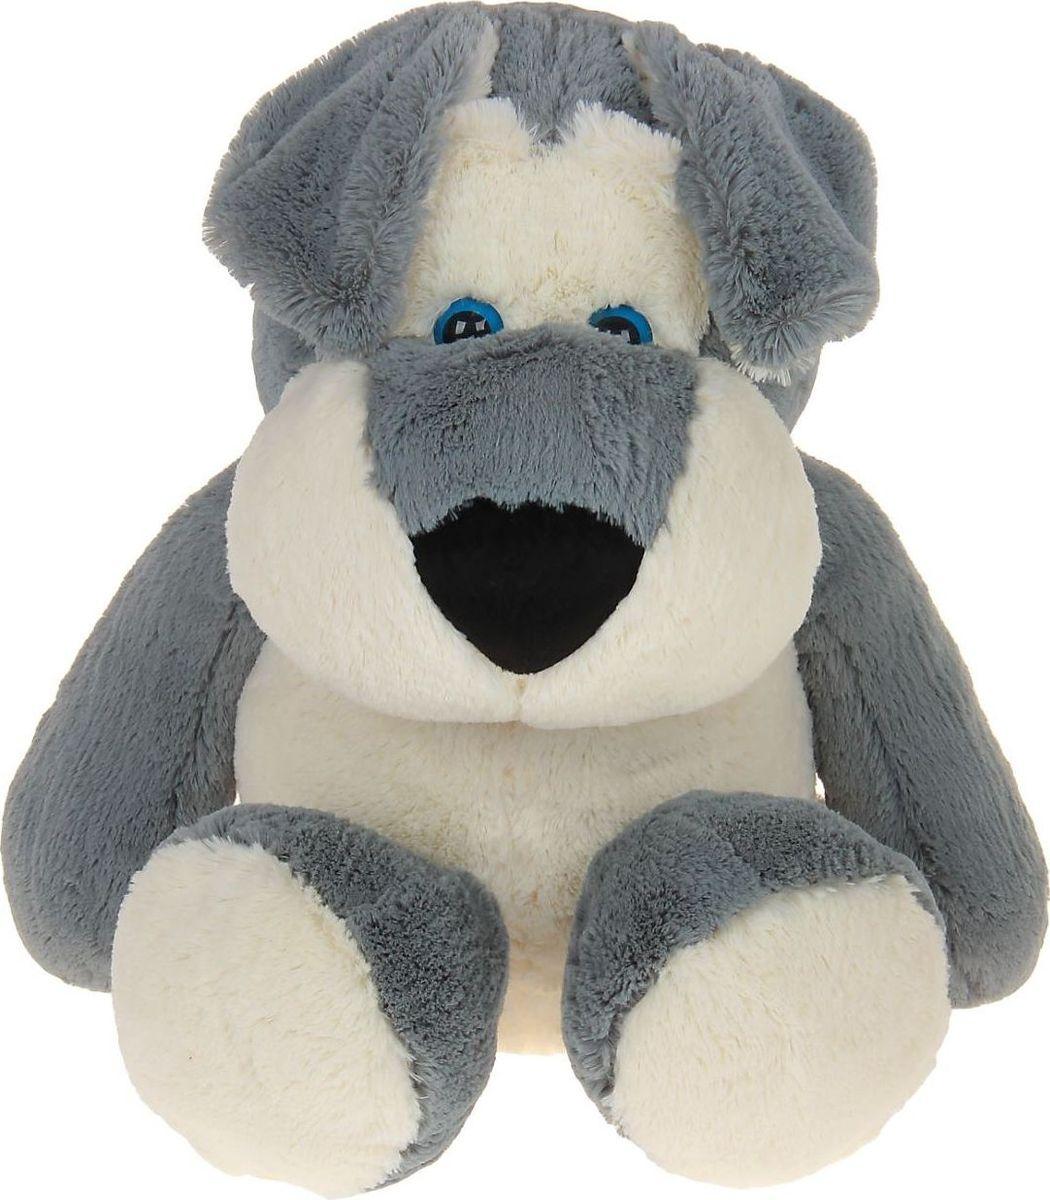 Sima-land Мягкая игрушка Собака Спайк Premium Quality цвет дымчатый 55 см sima land мягкая игрушка собака пятнашка 80 см